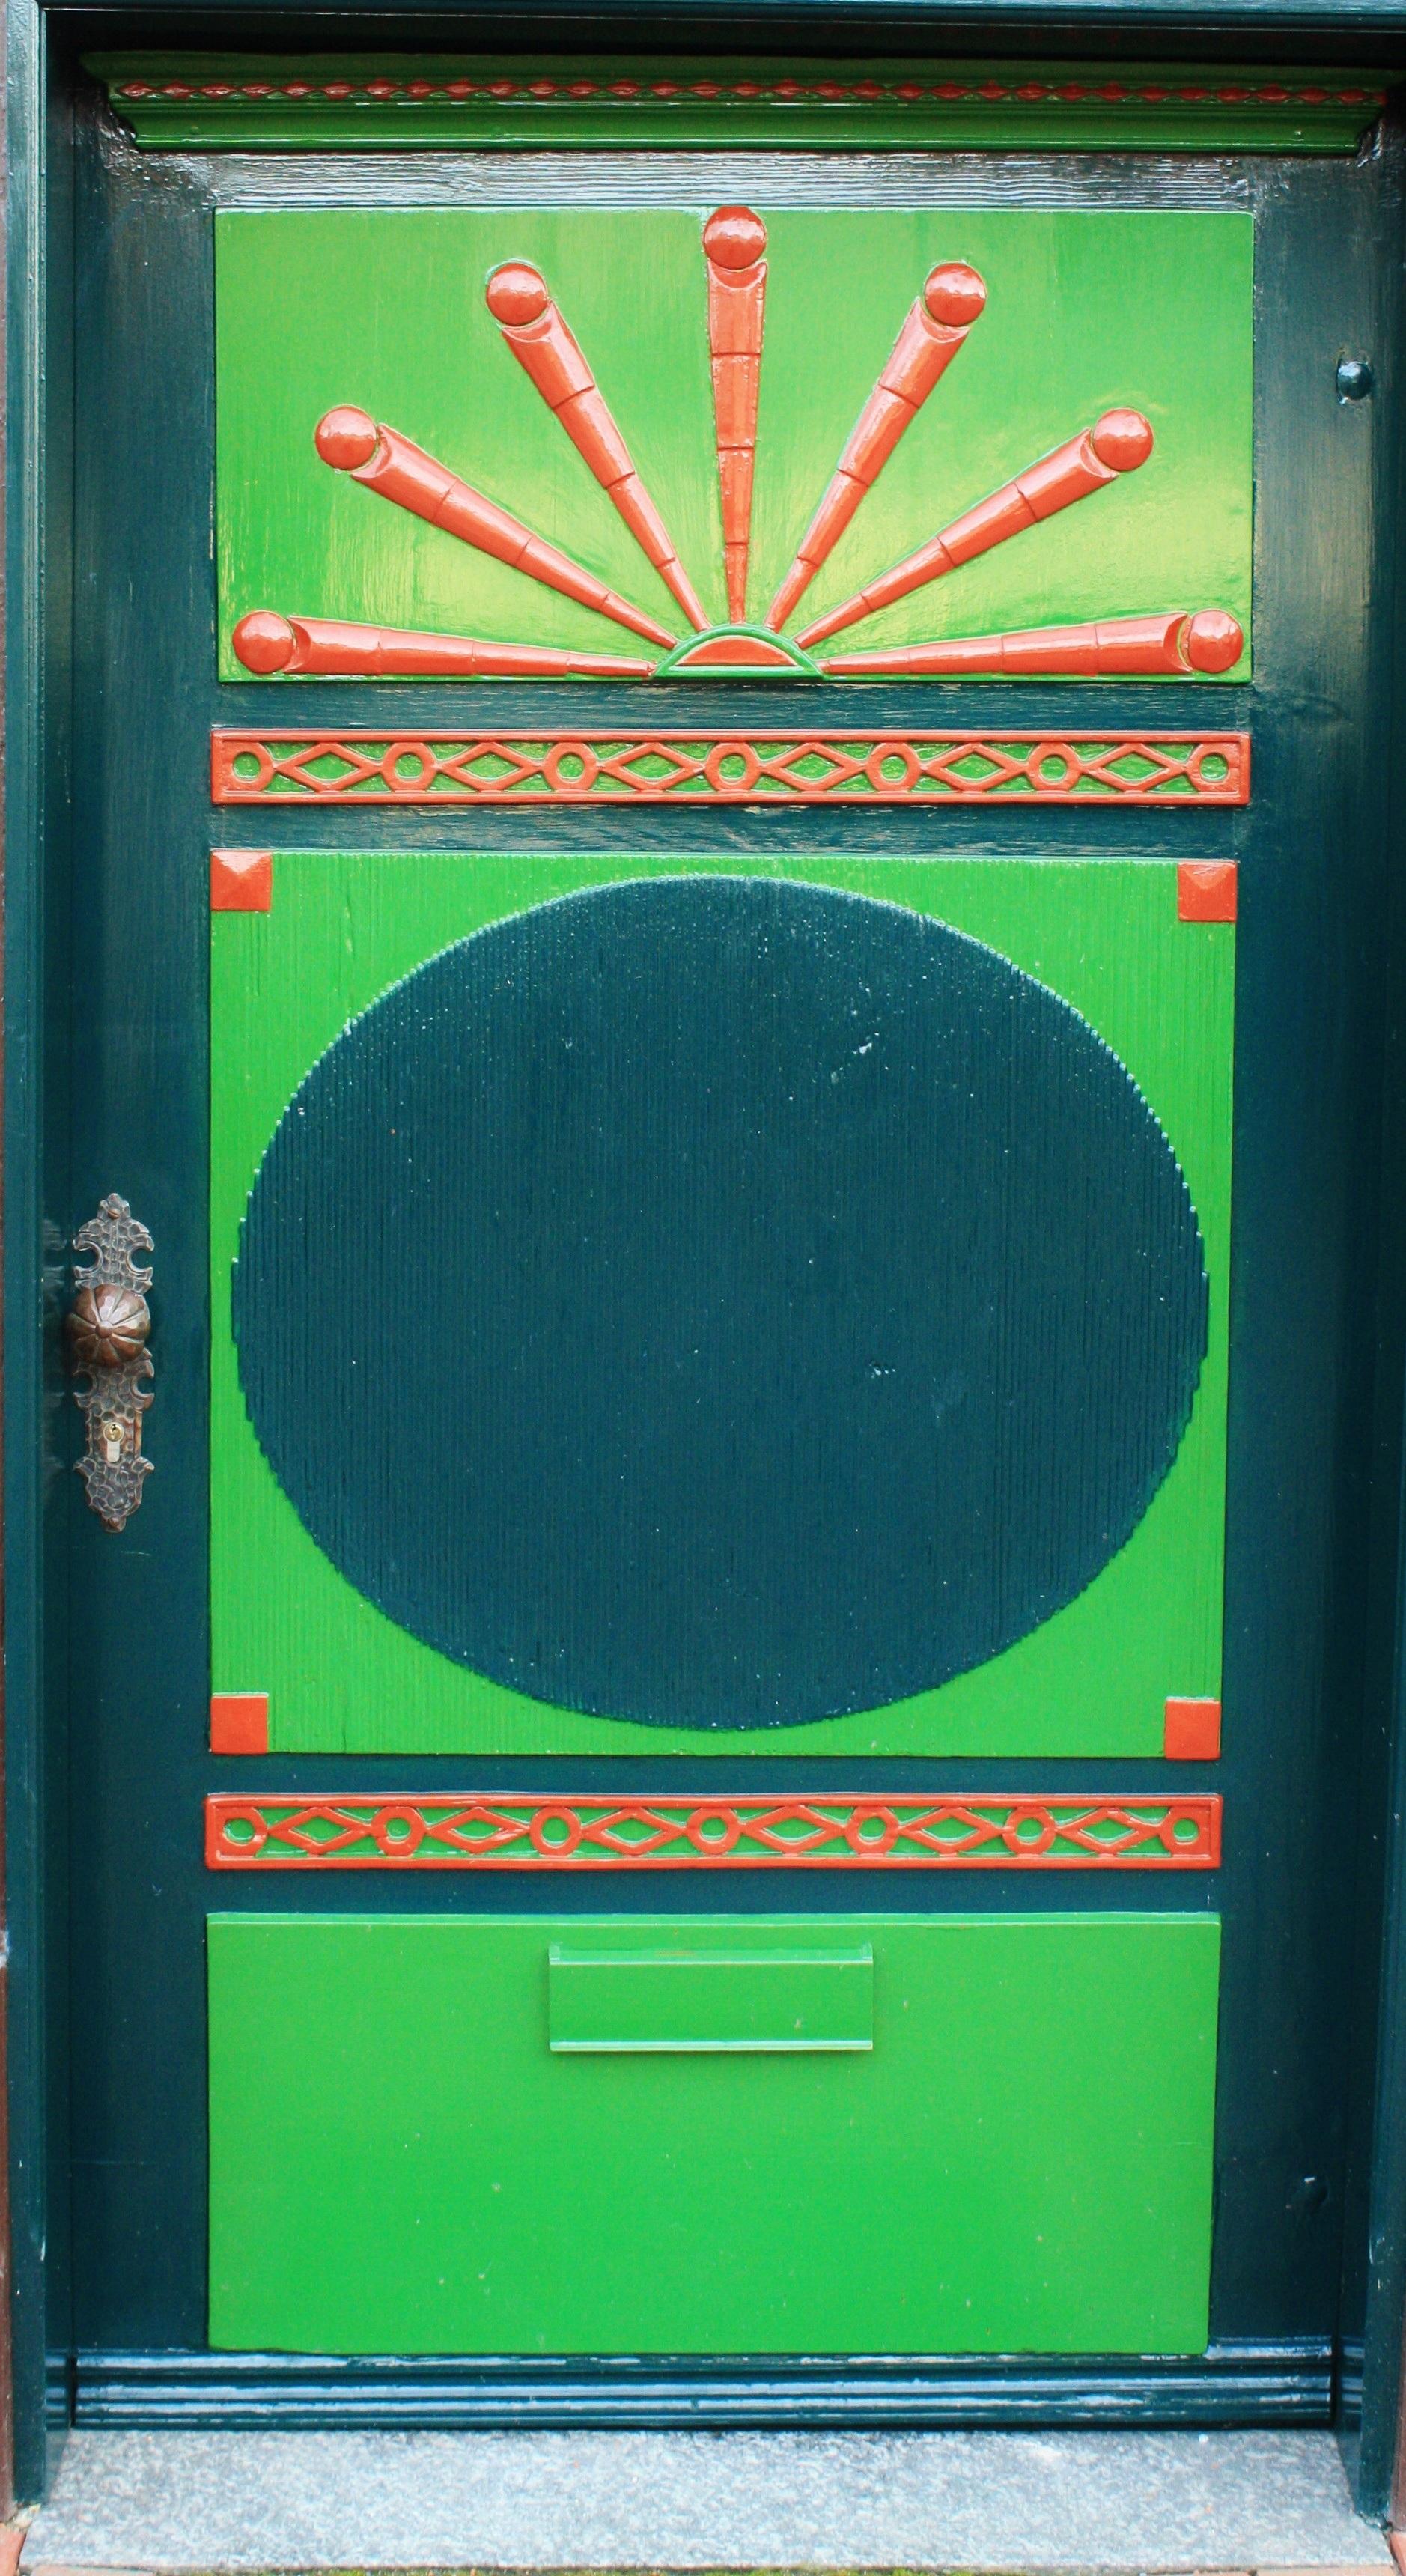 Como enmarcar un poster en casa final fantasy hd pster enmarcado galera wrap lmina regalo - Como enmarcar un poster en casa ...